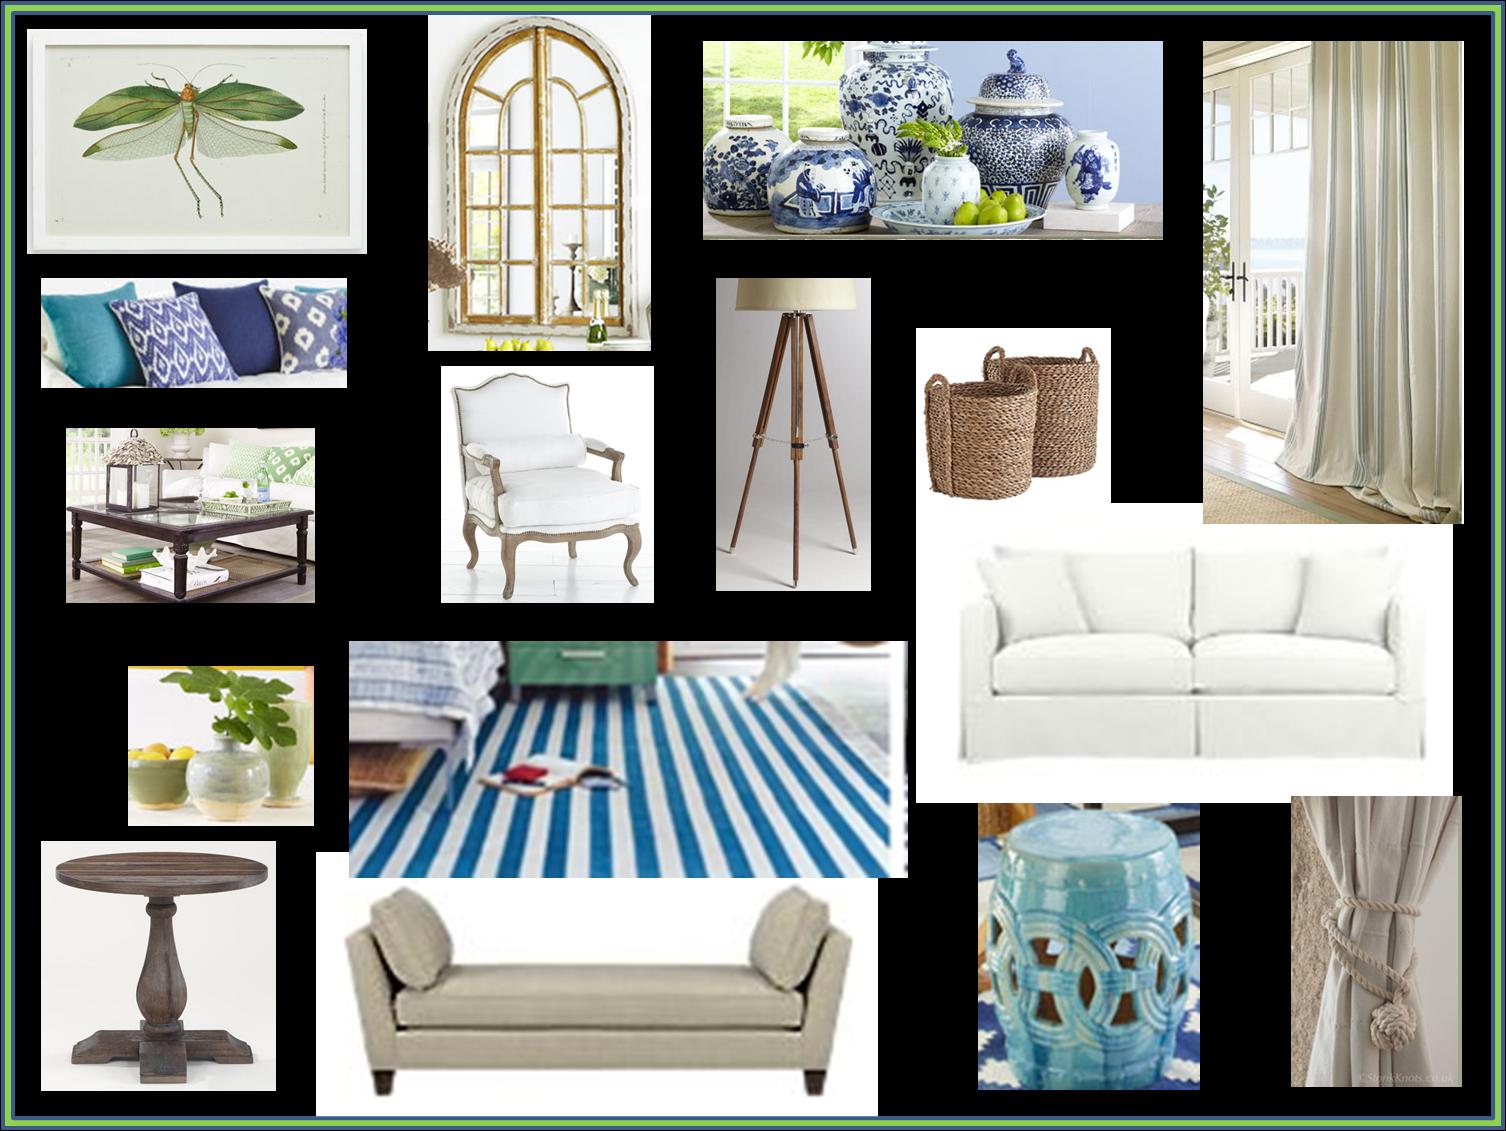 Kyla 39 s oasis living room mood board for Room design mood board